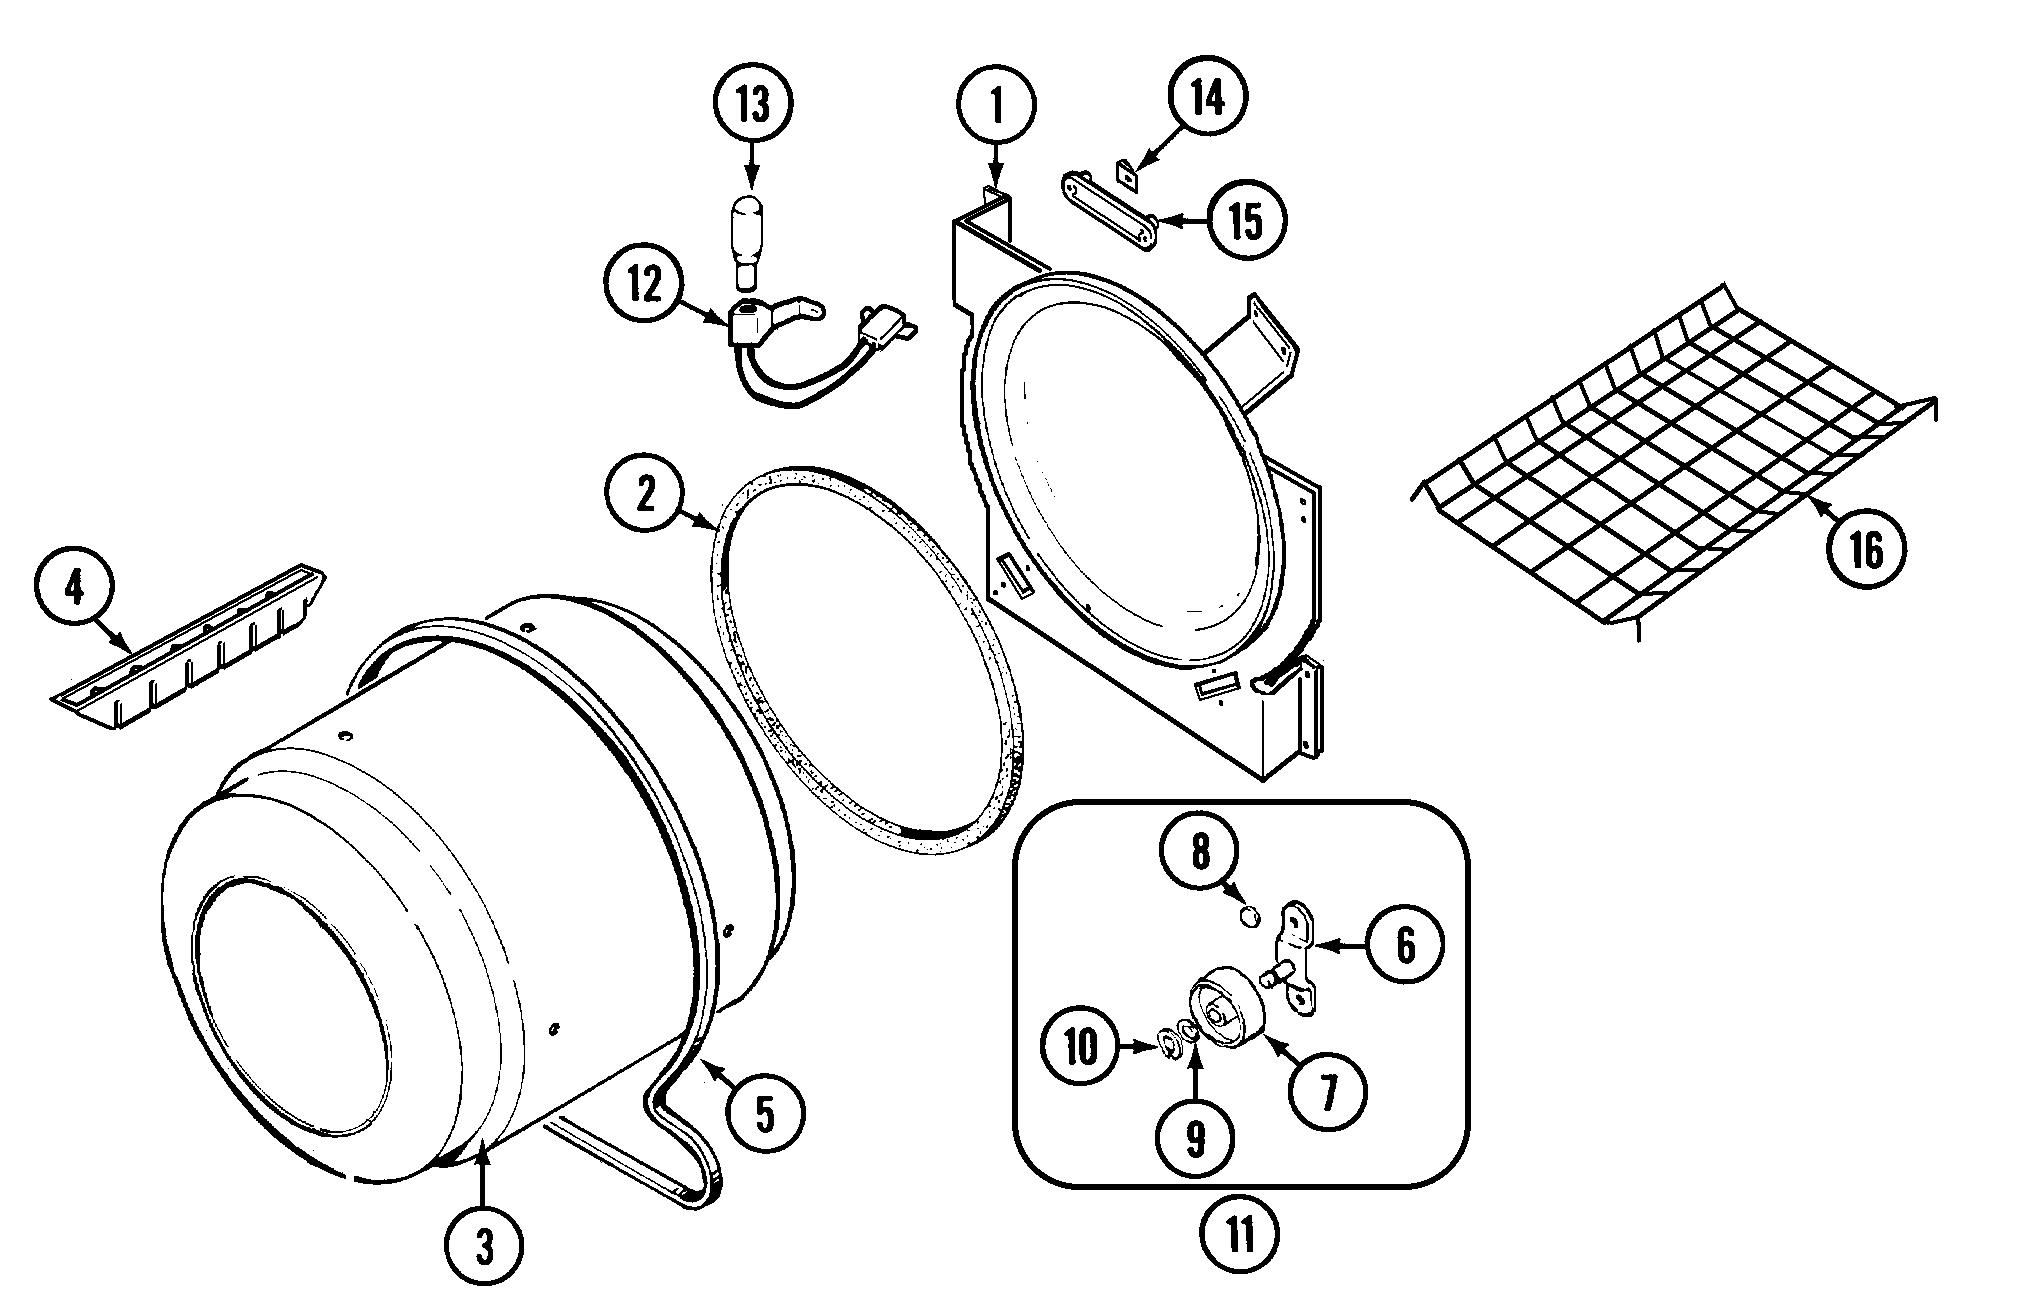 Crosley model CDG22B8V residential dryer genuine parts